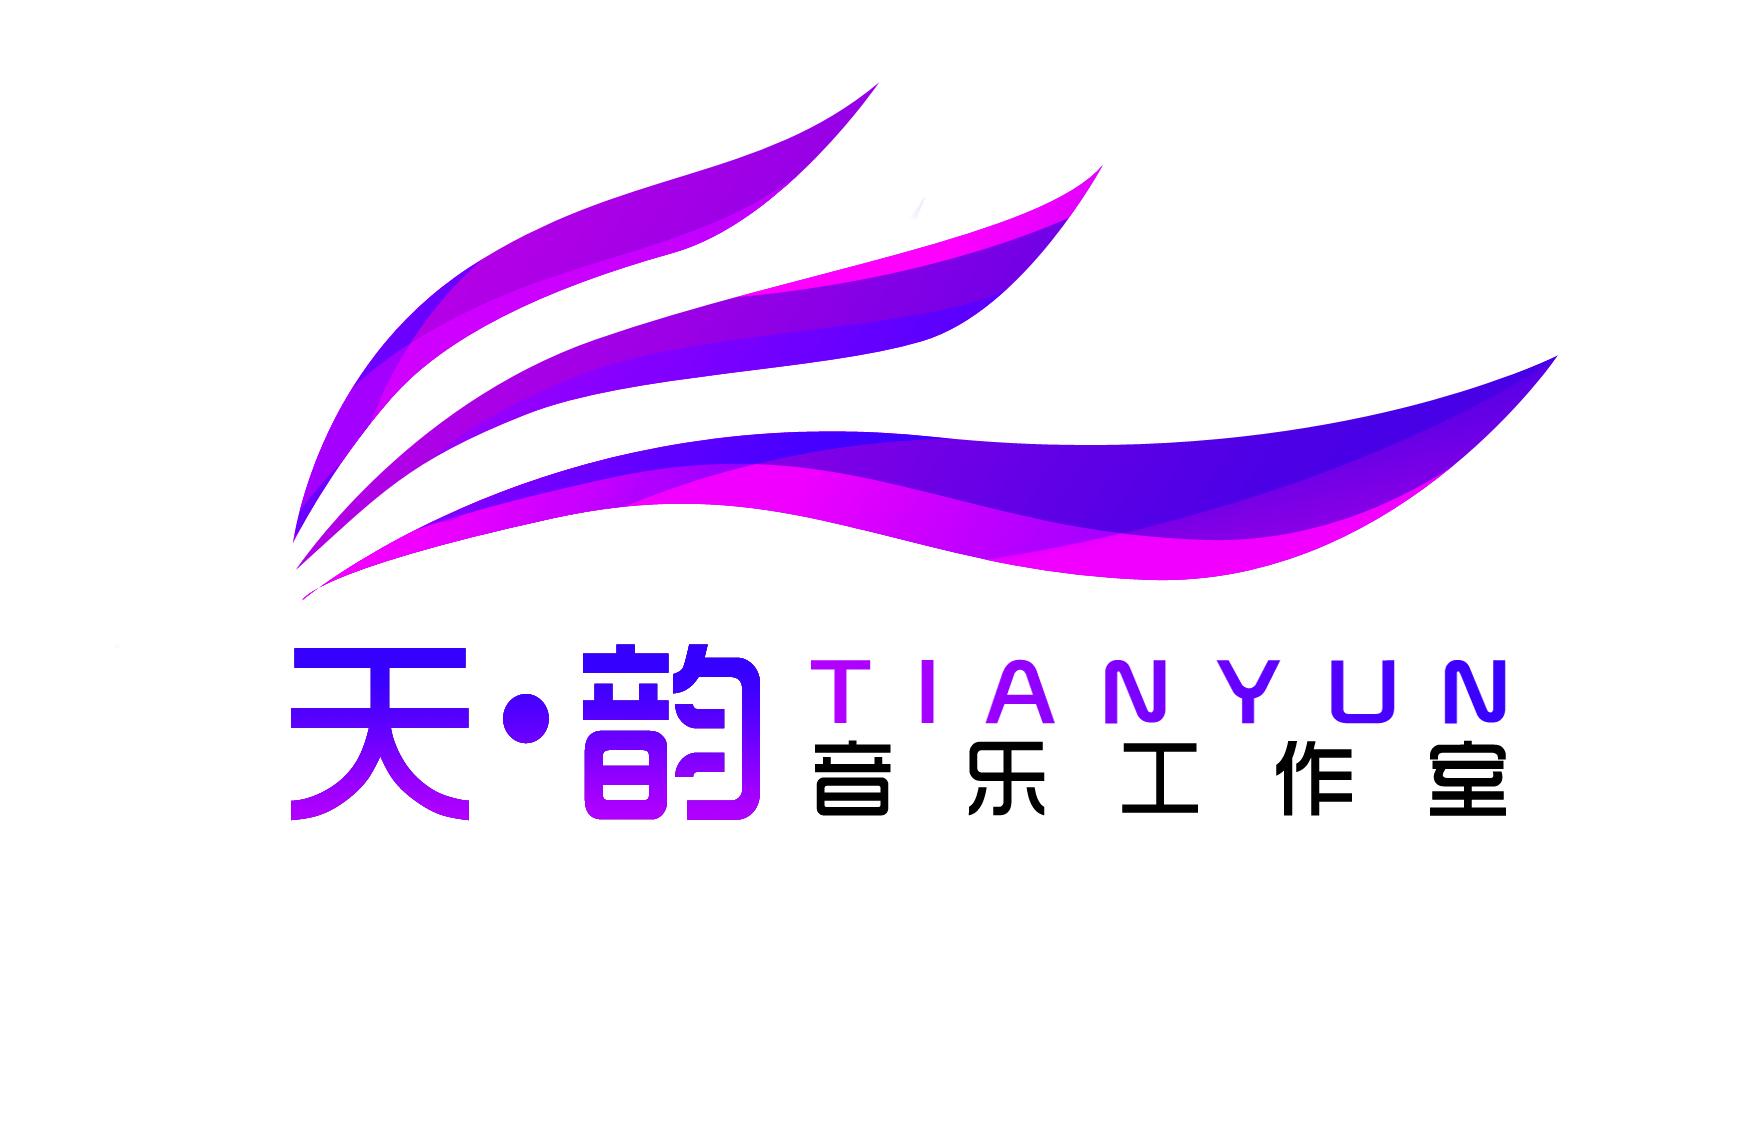 logo logo 标志 设计 图标 1759_1140